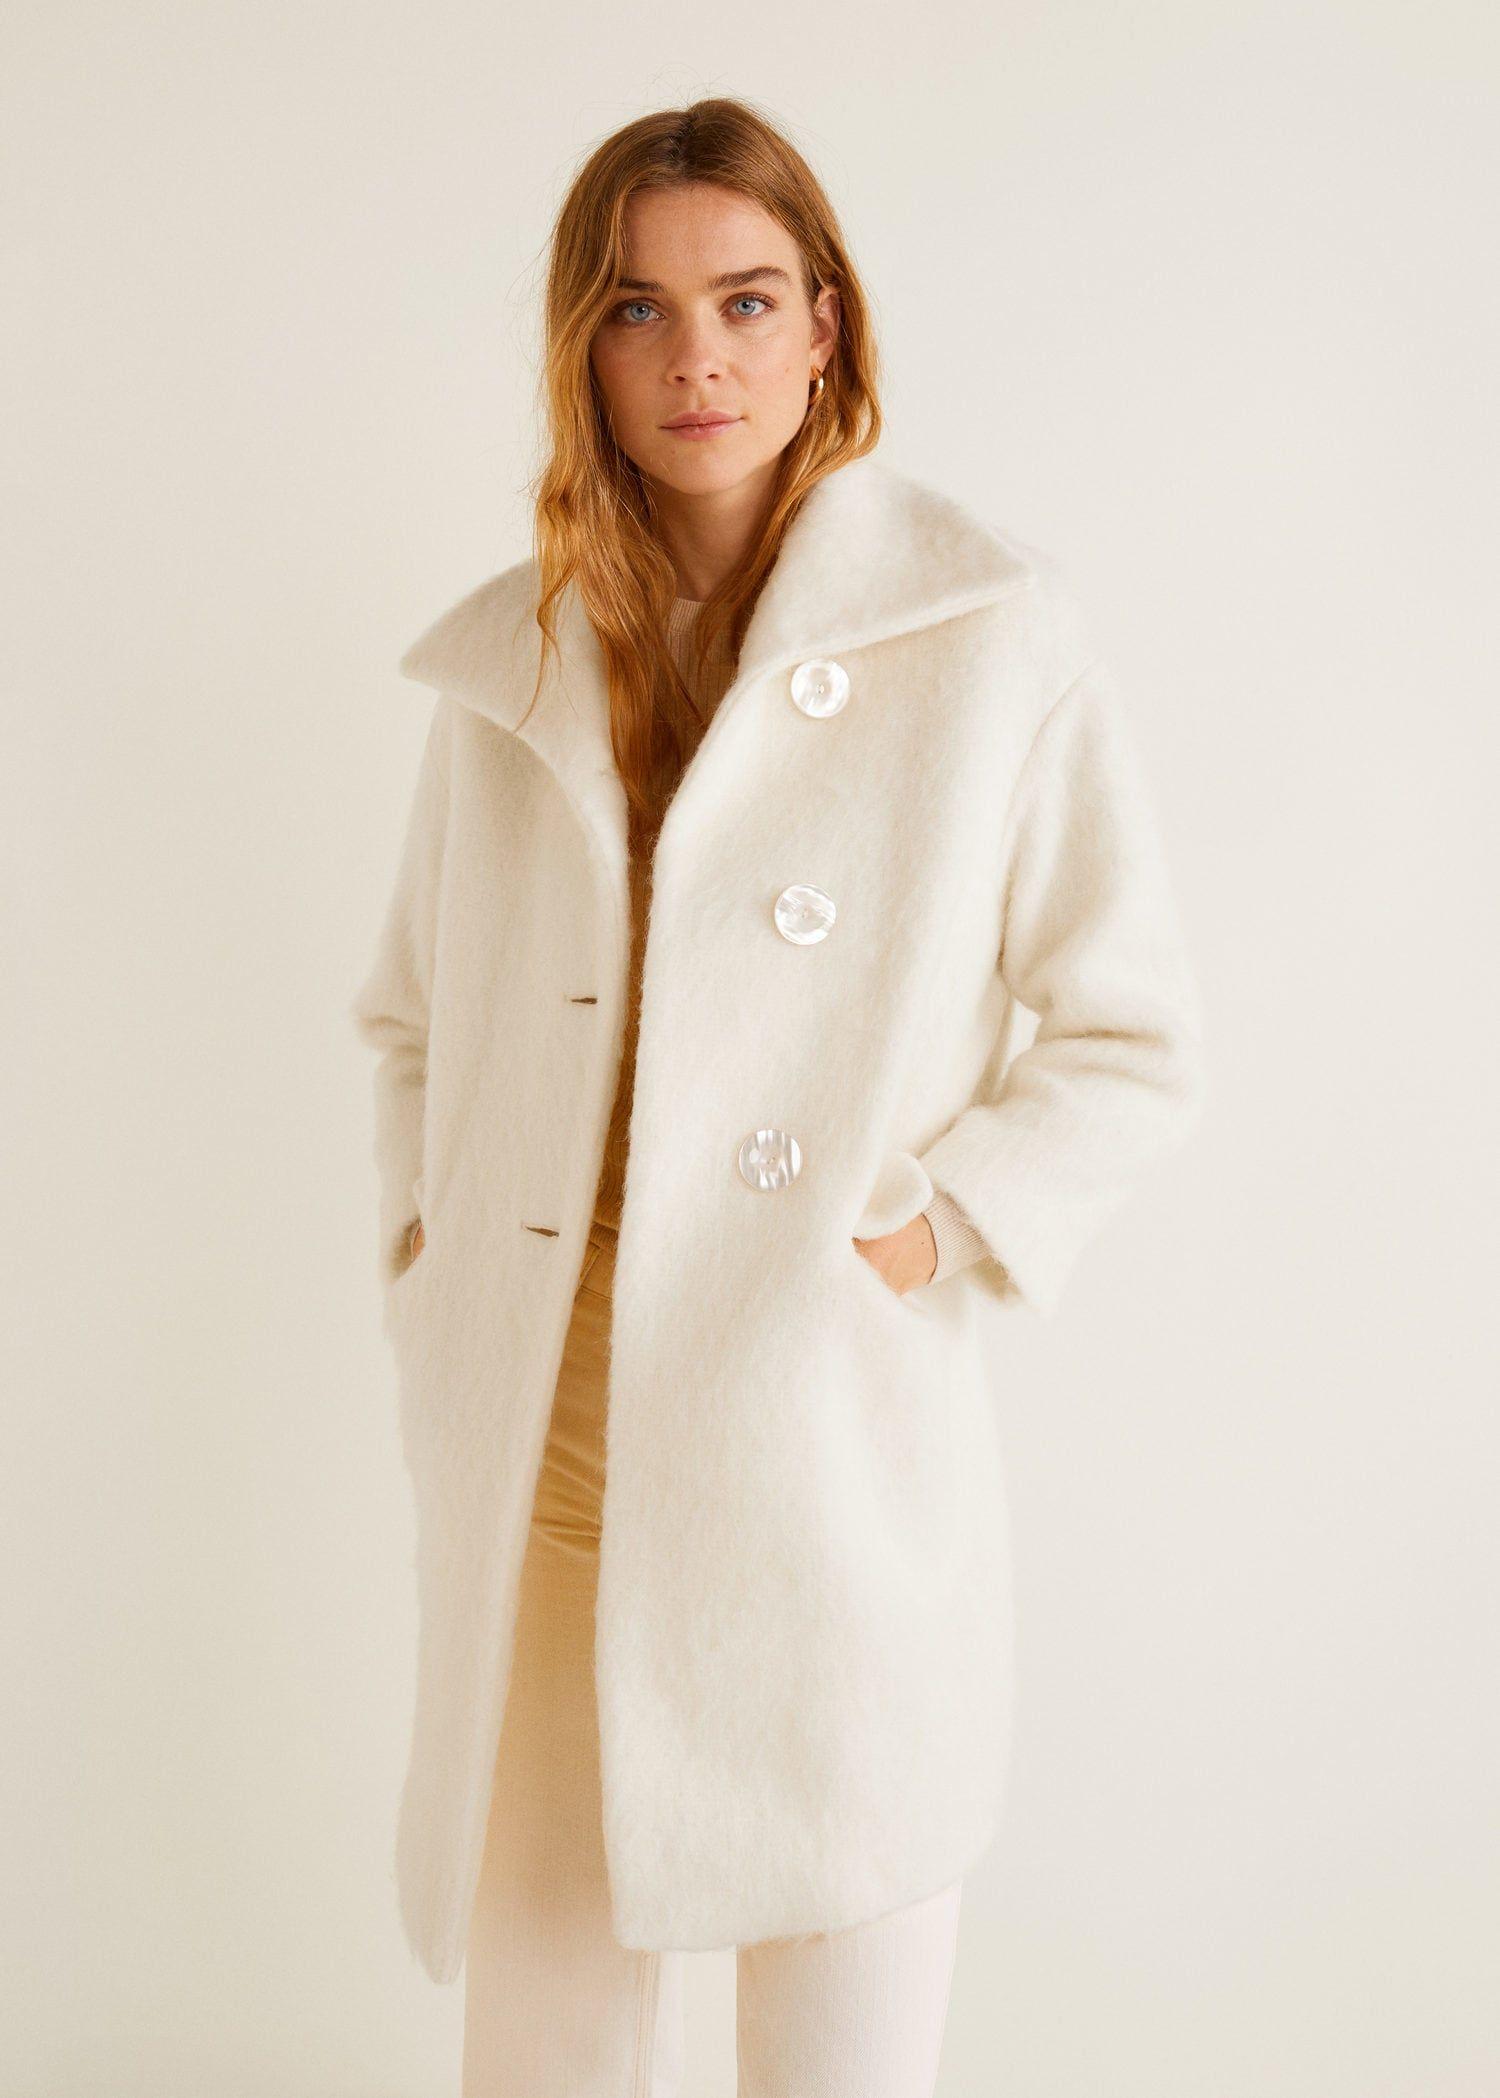 manteau ecru femme fourrure